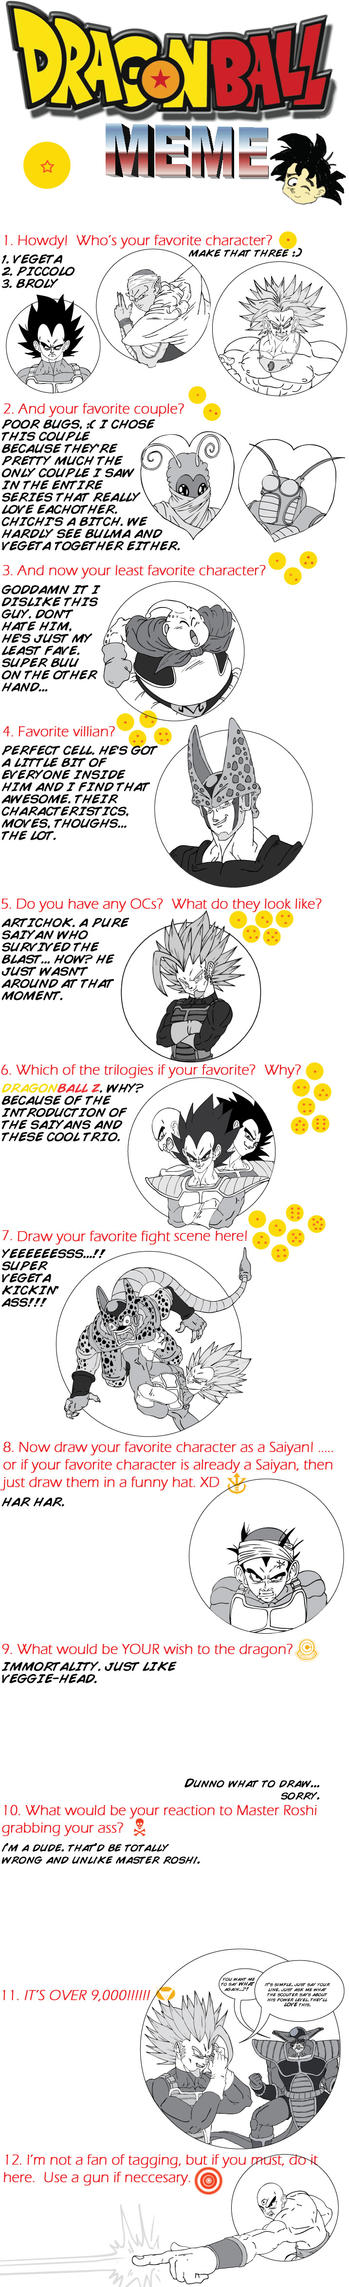 Dragonball meme by Fonzu